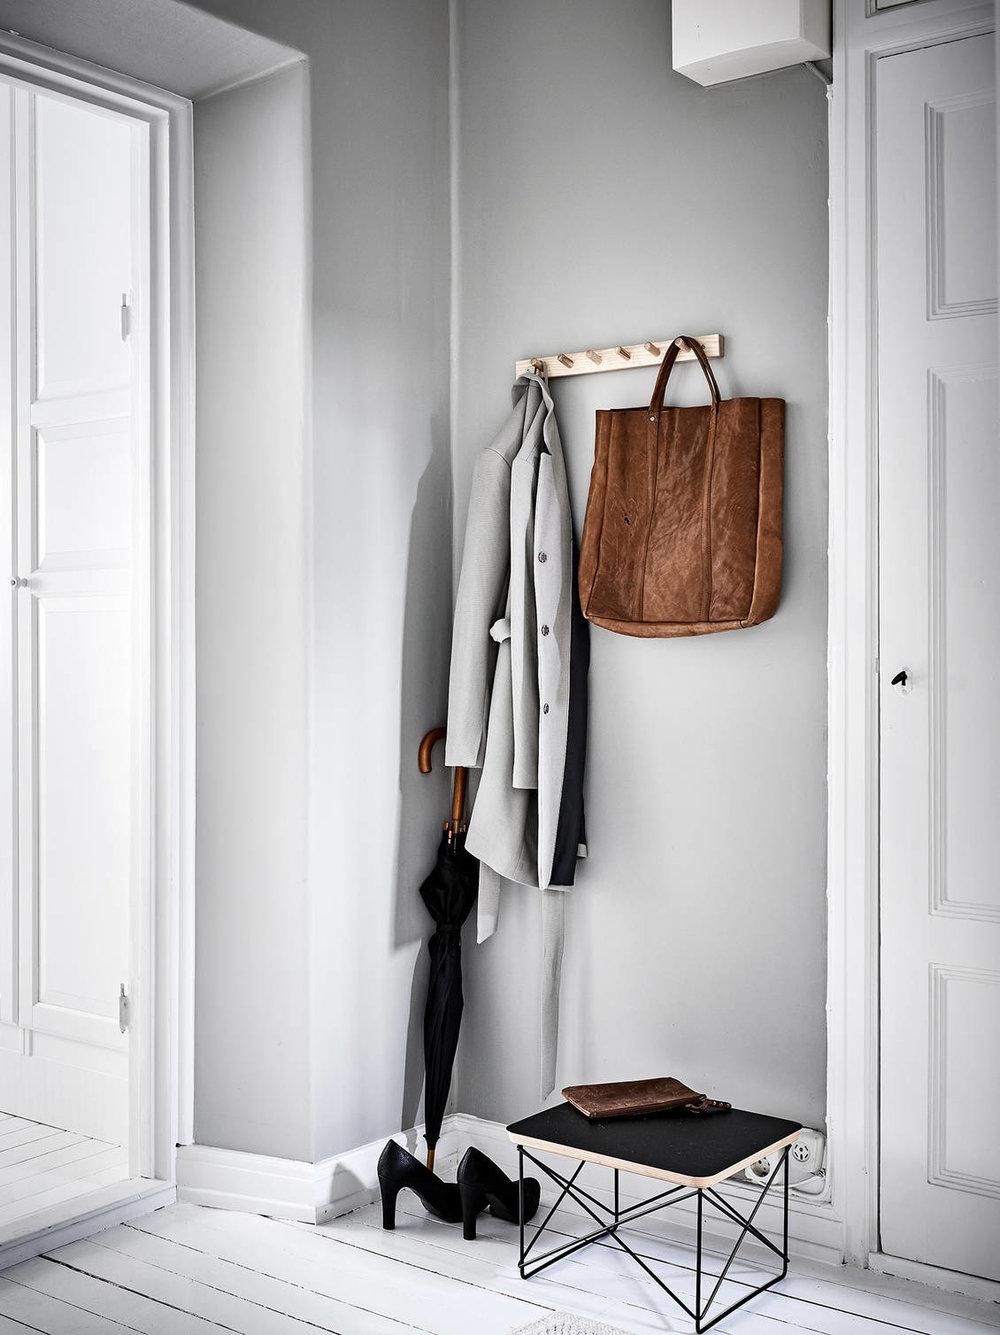 The Nordroom - A Neutral Scandinavian Studio Apartment